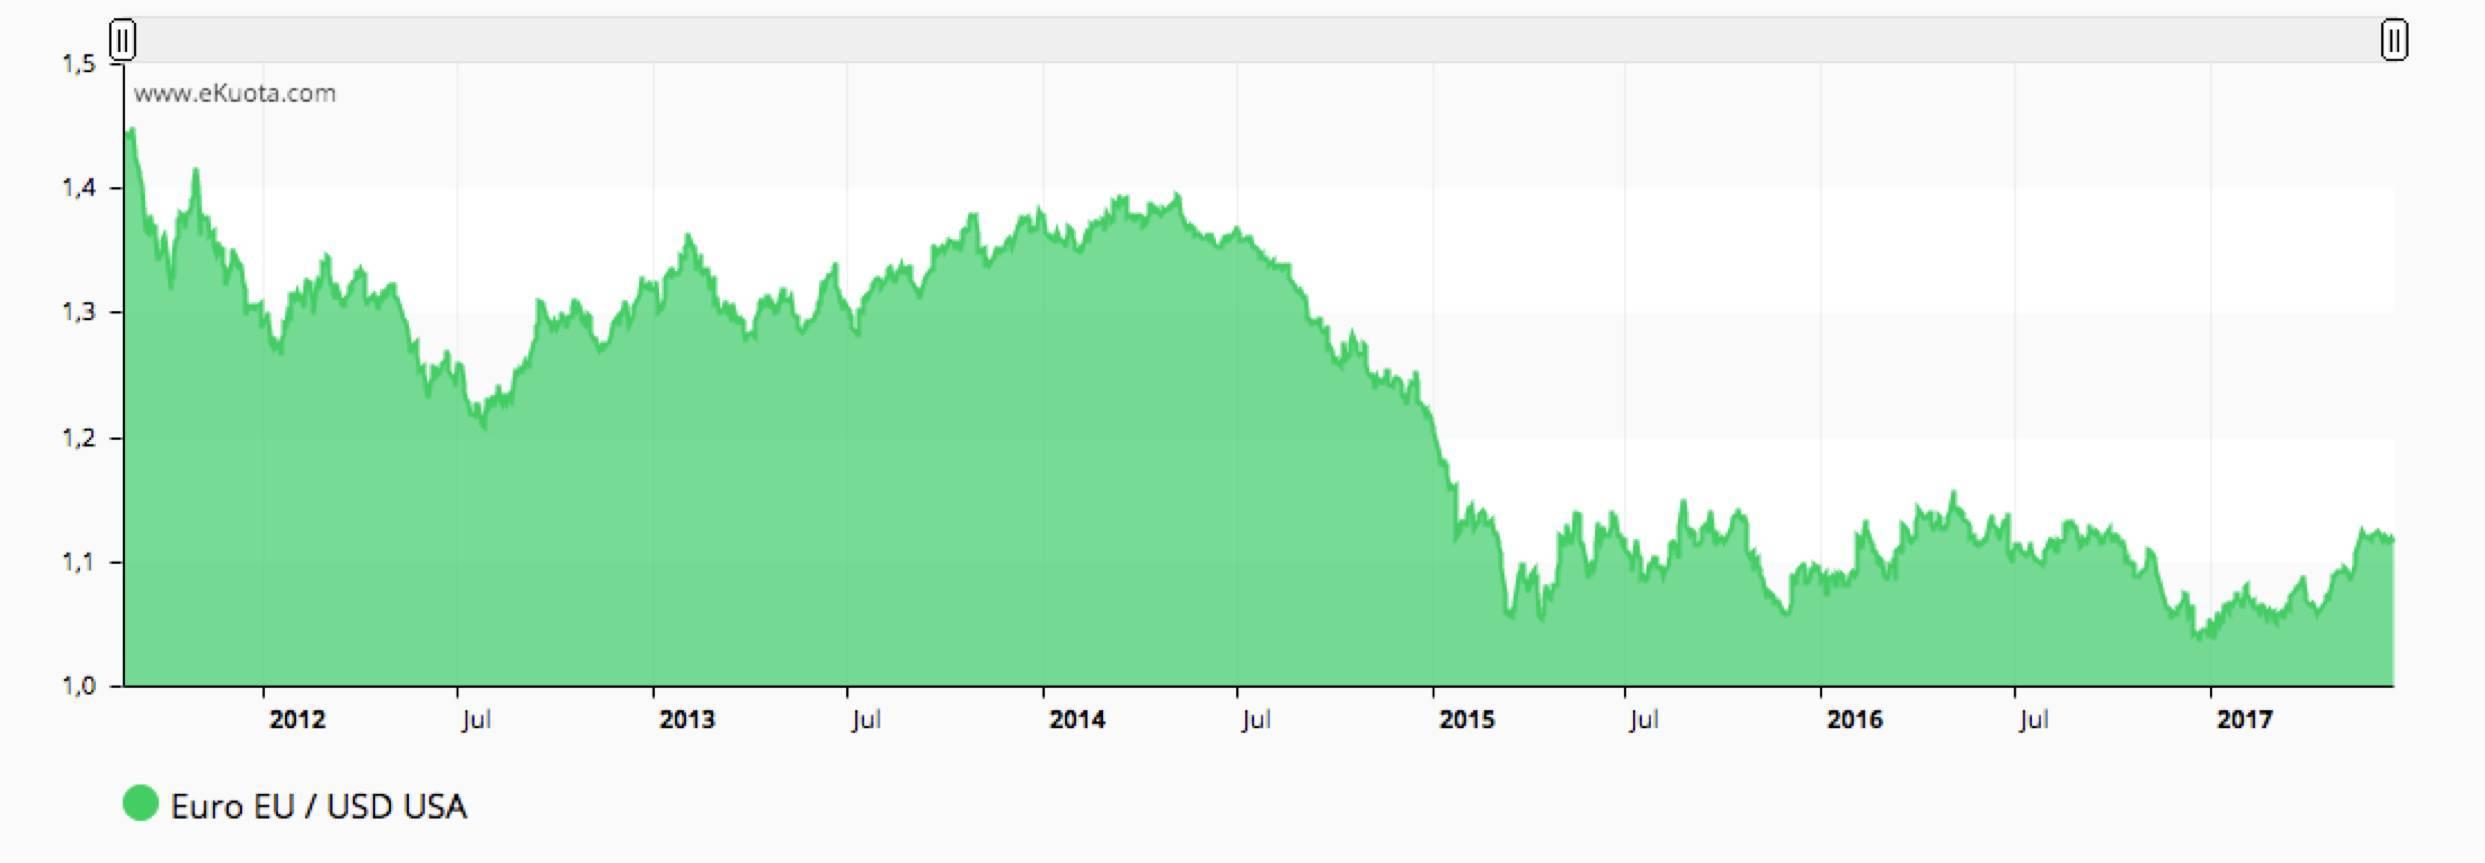 Euro US Dollar FX - ekuota.com